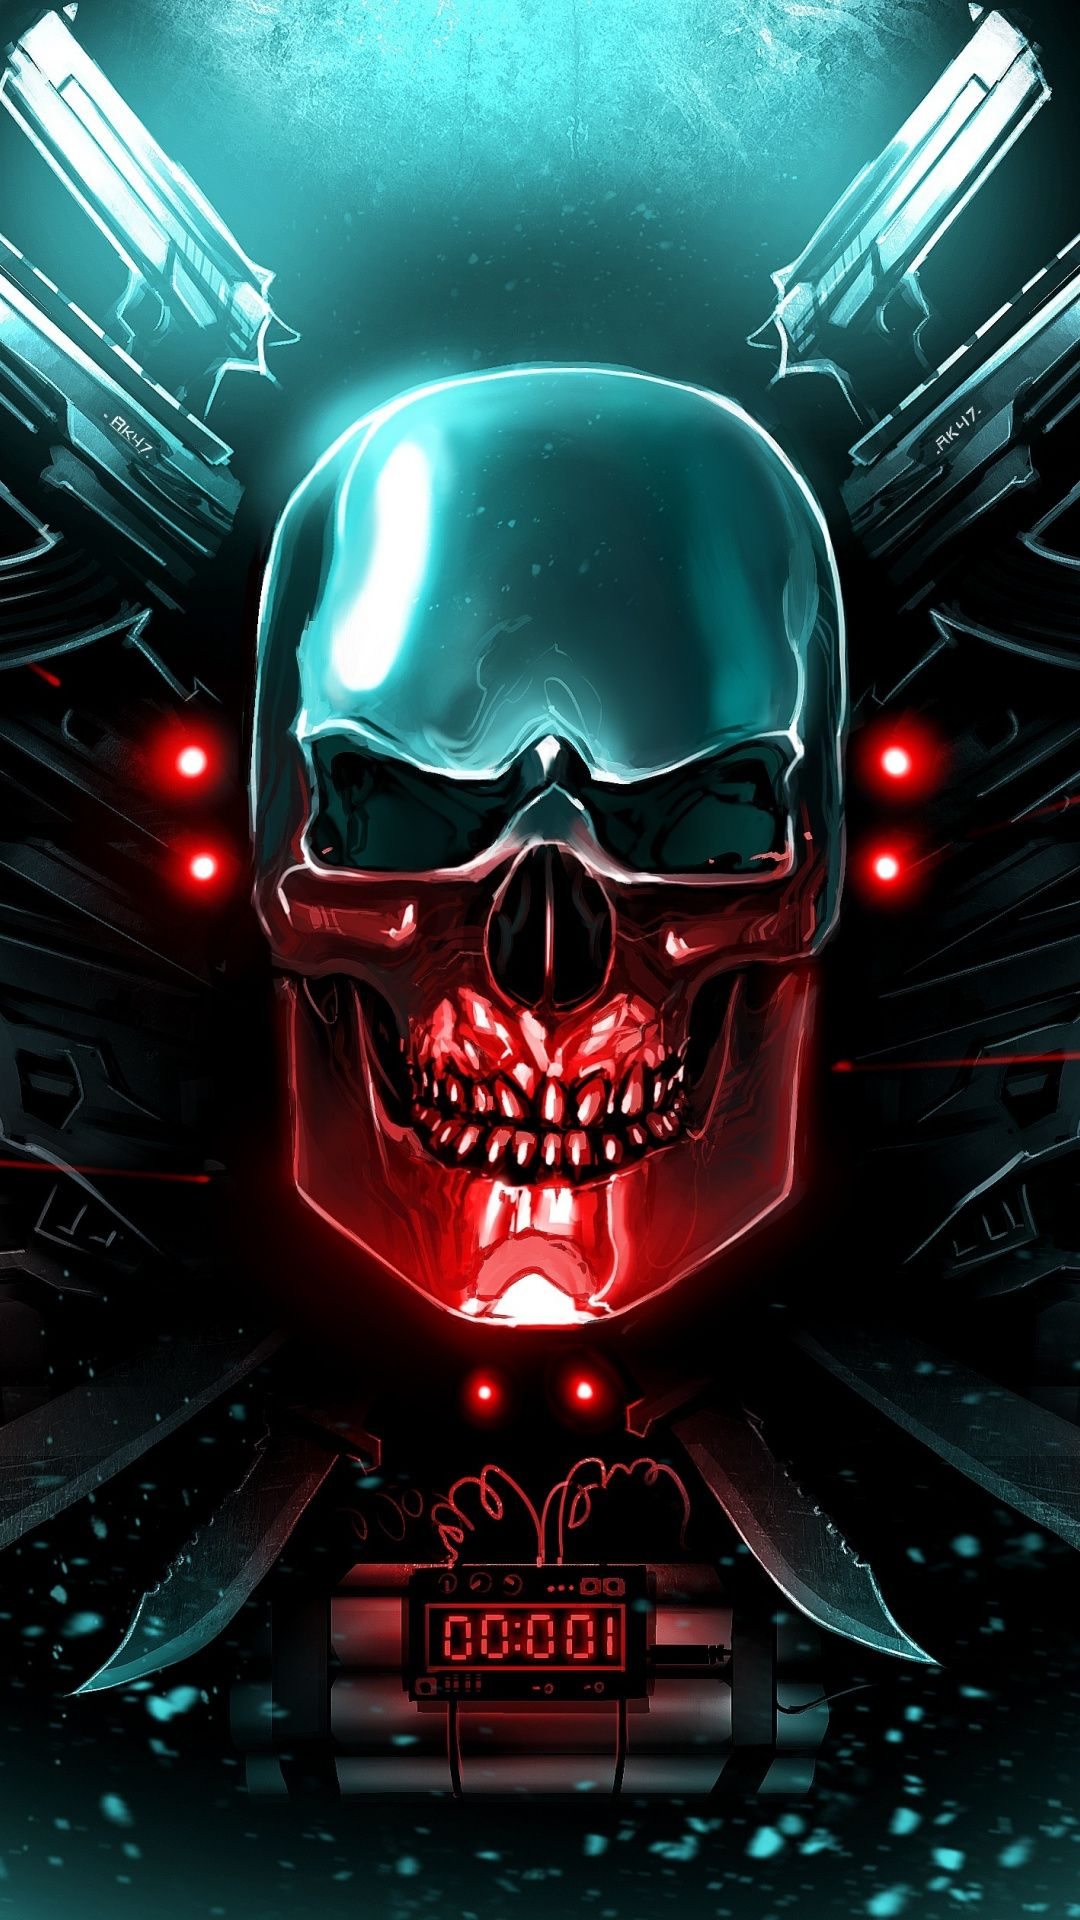 Countdown, metal skull, guns, art, 1080x1920 wallpaper